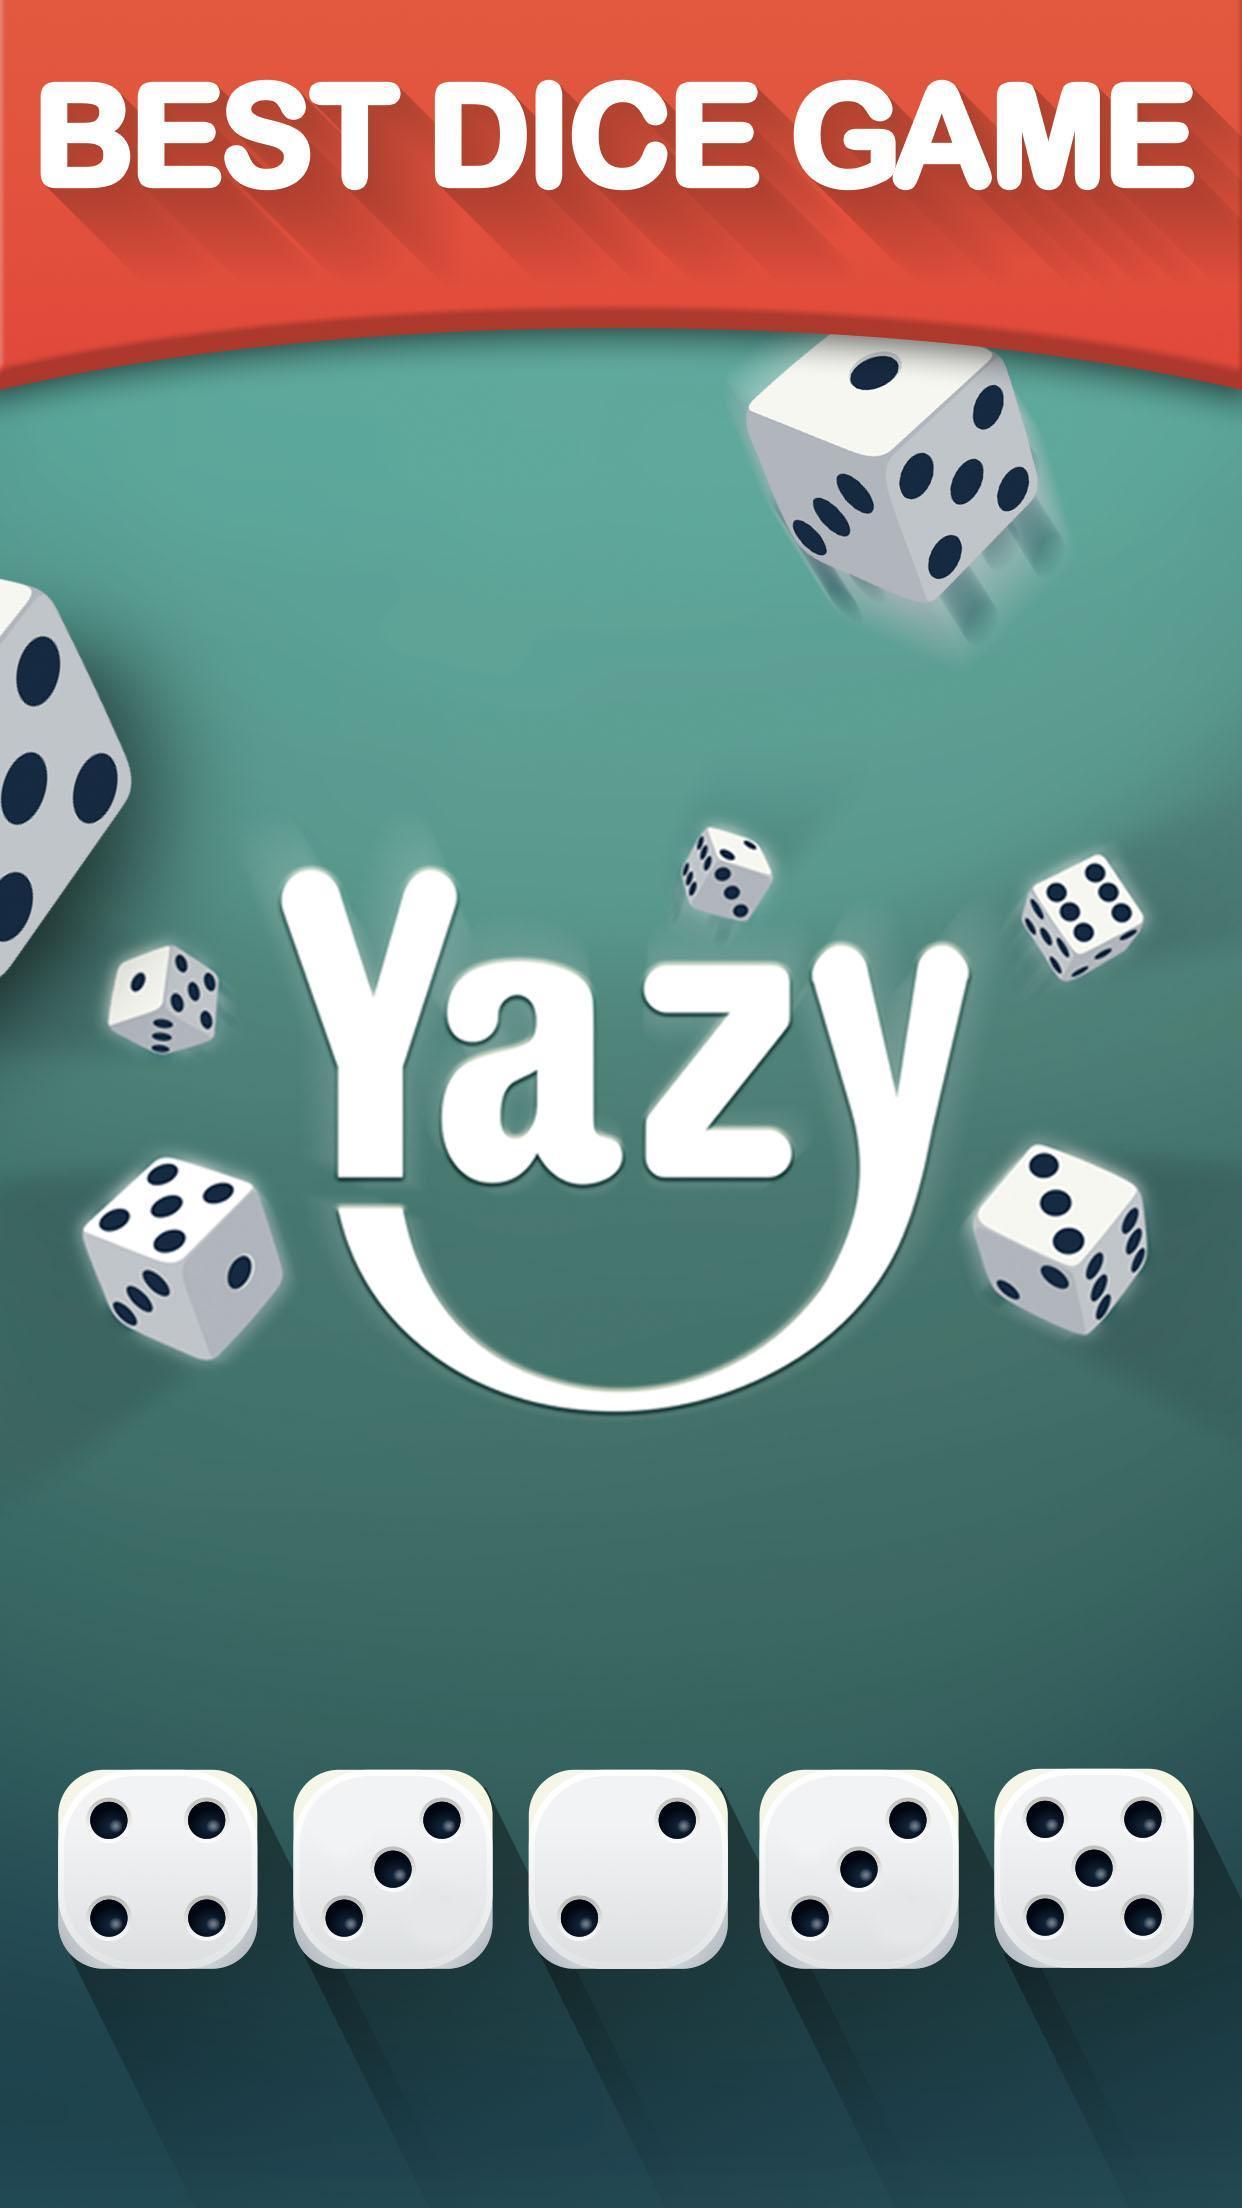 Yazy the best yatzy dice game 1.0.36 Screenshot 5